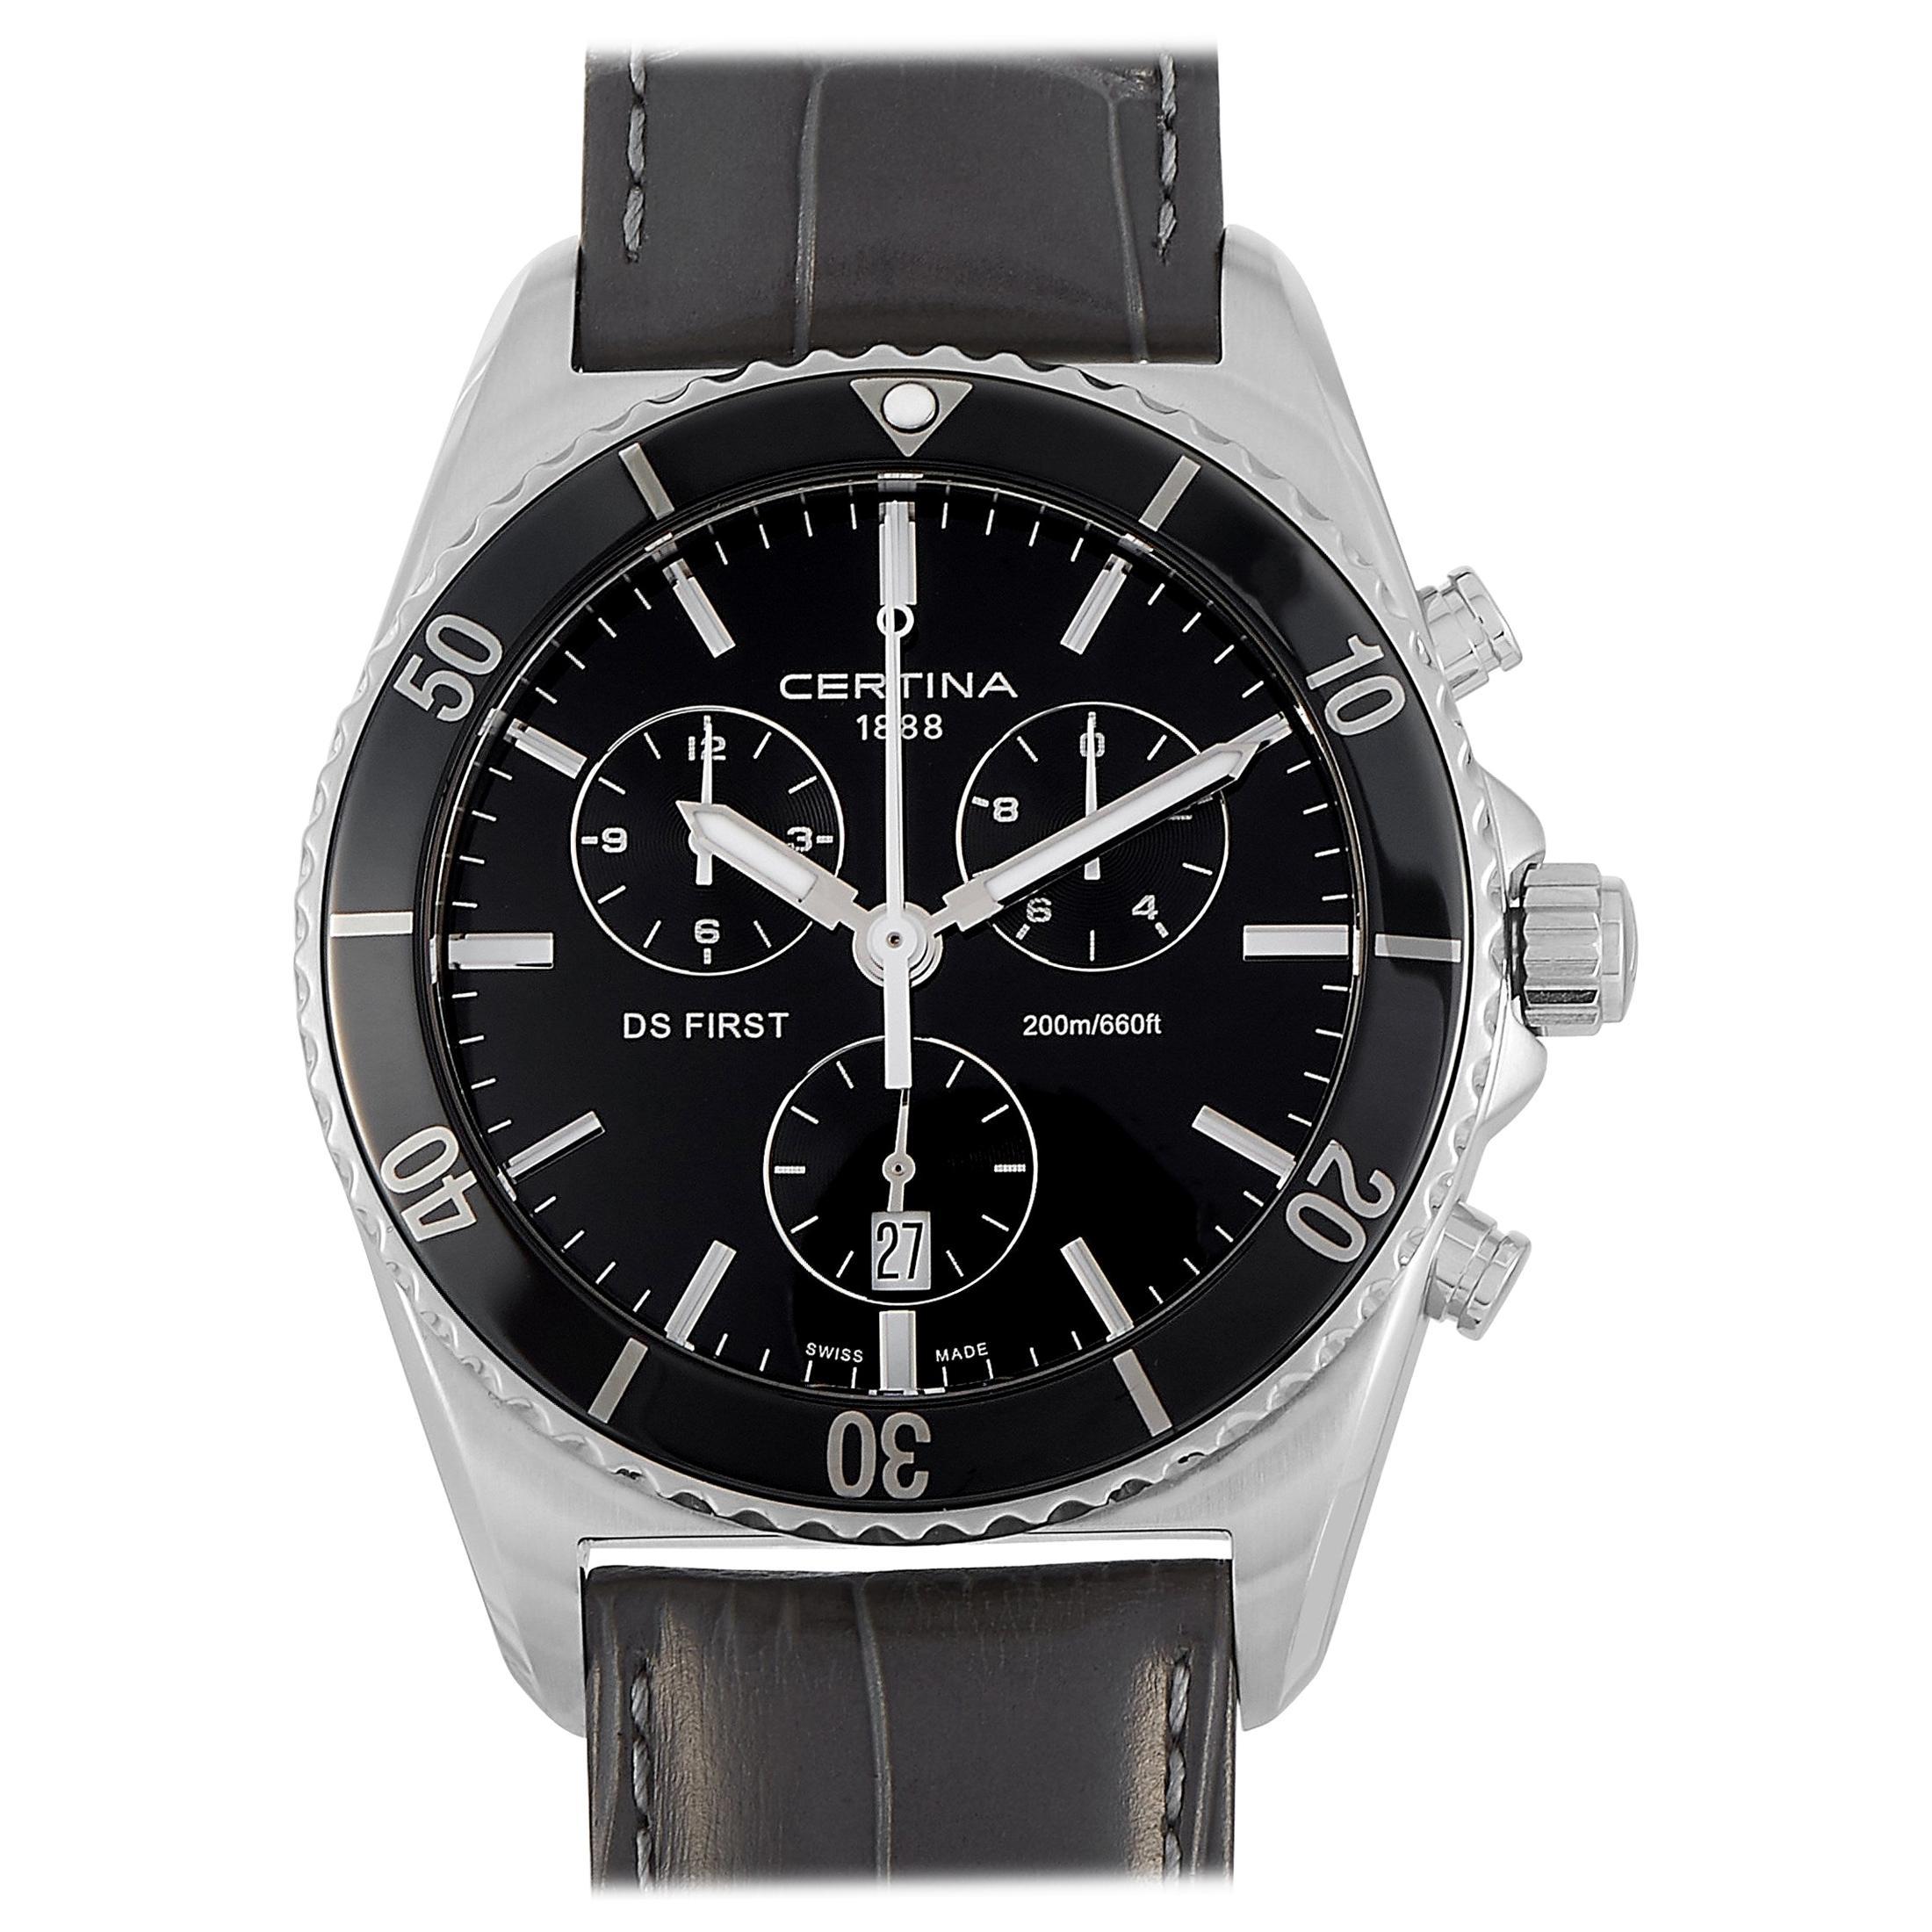 Certina DS First Ceramic Chronograph Men's Watch C014.417.16.051.00